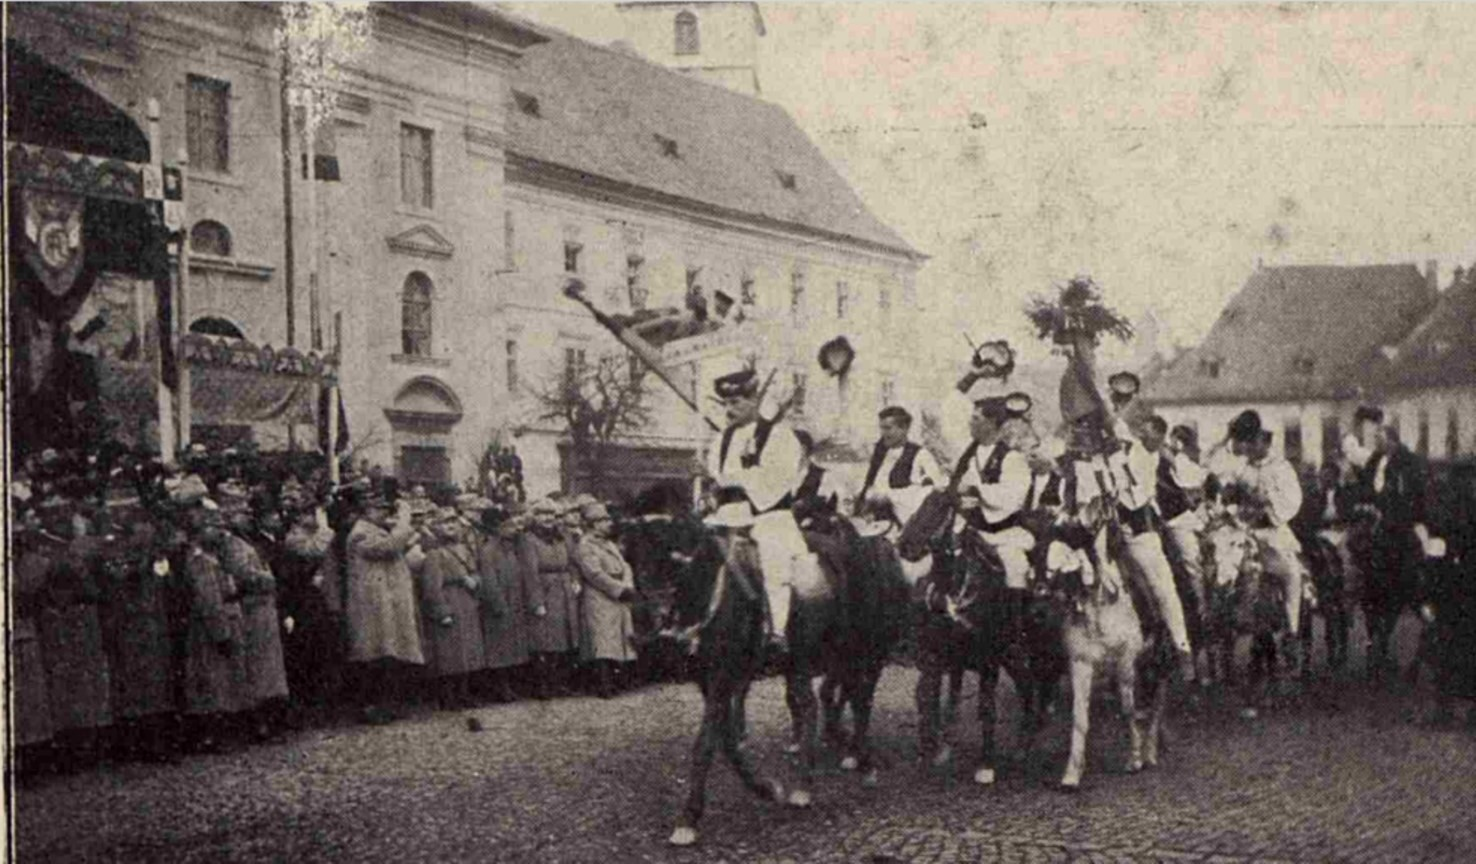 Gral Berthelot in Ardeal LUCEAFARUL 3 1919 ian 15